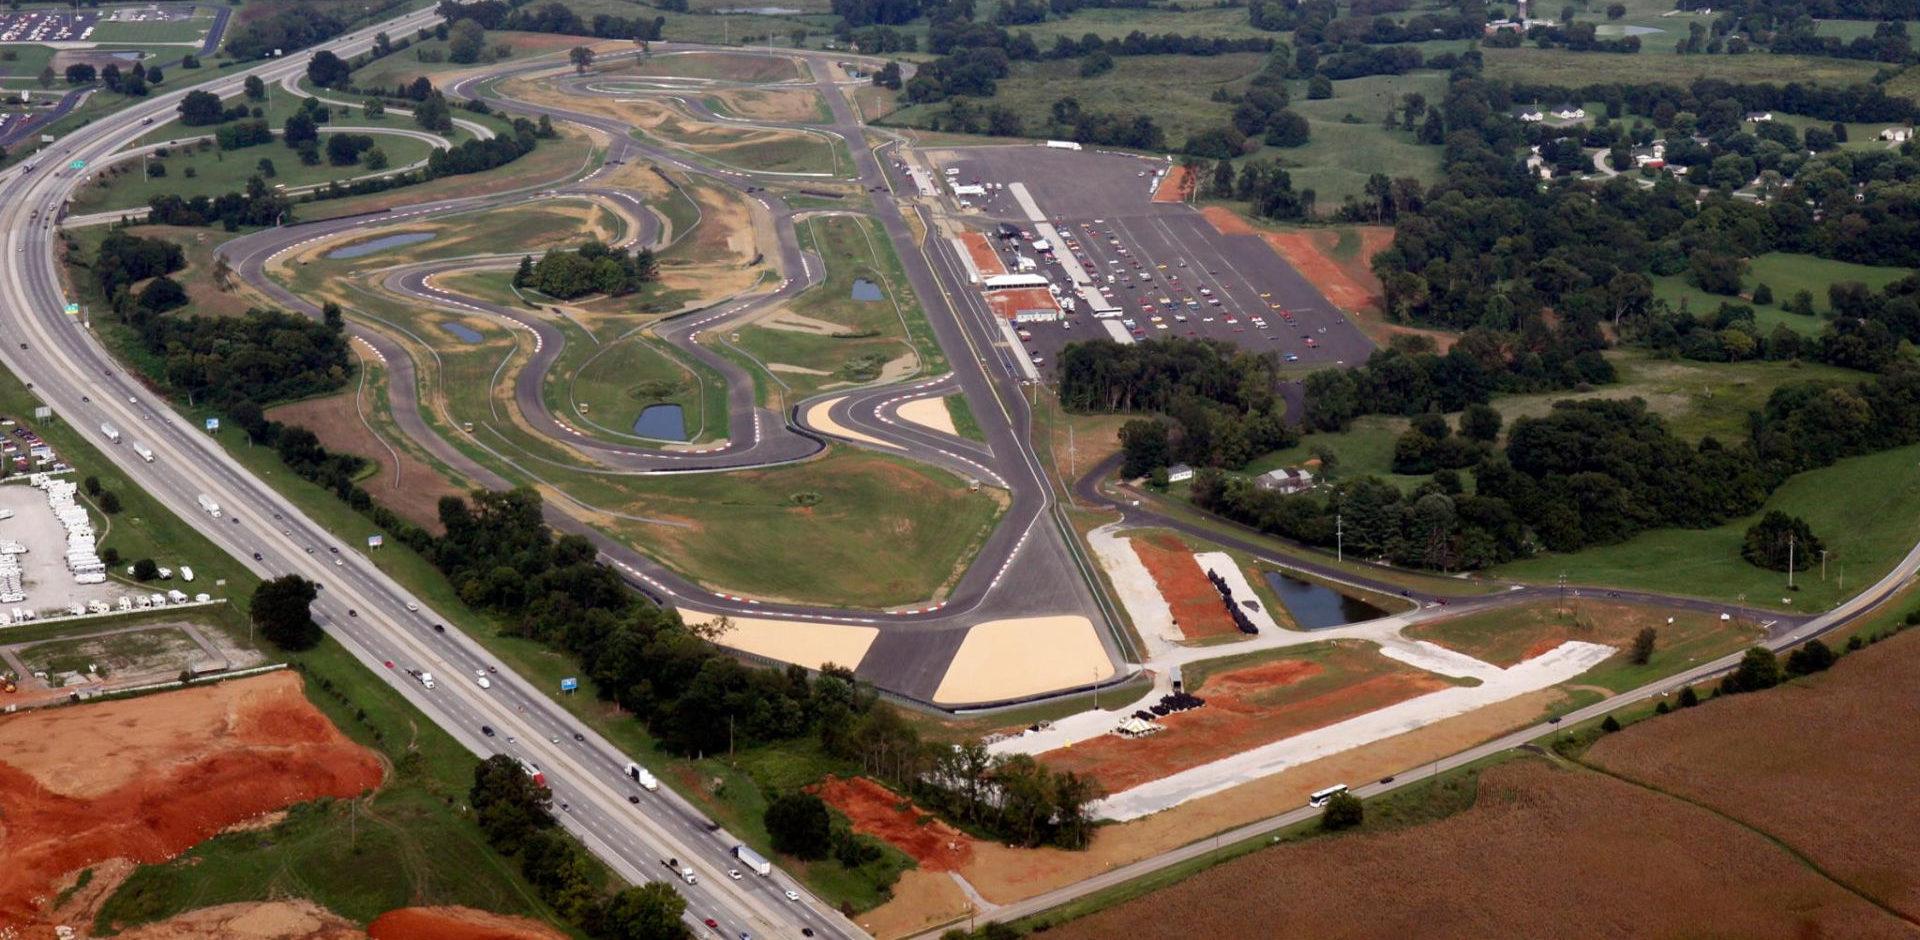 NCM Motorsports Park. Photo courtesy of NCM Motorsports Park.